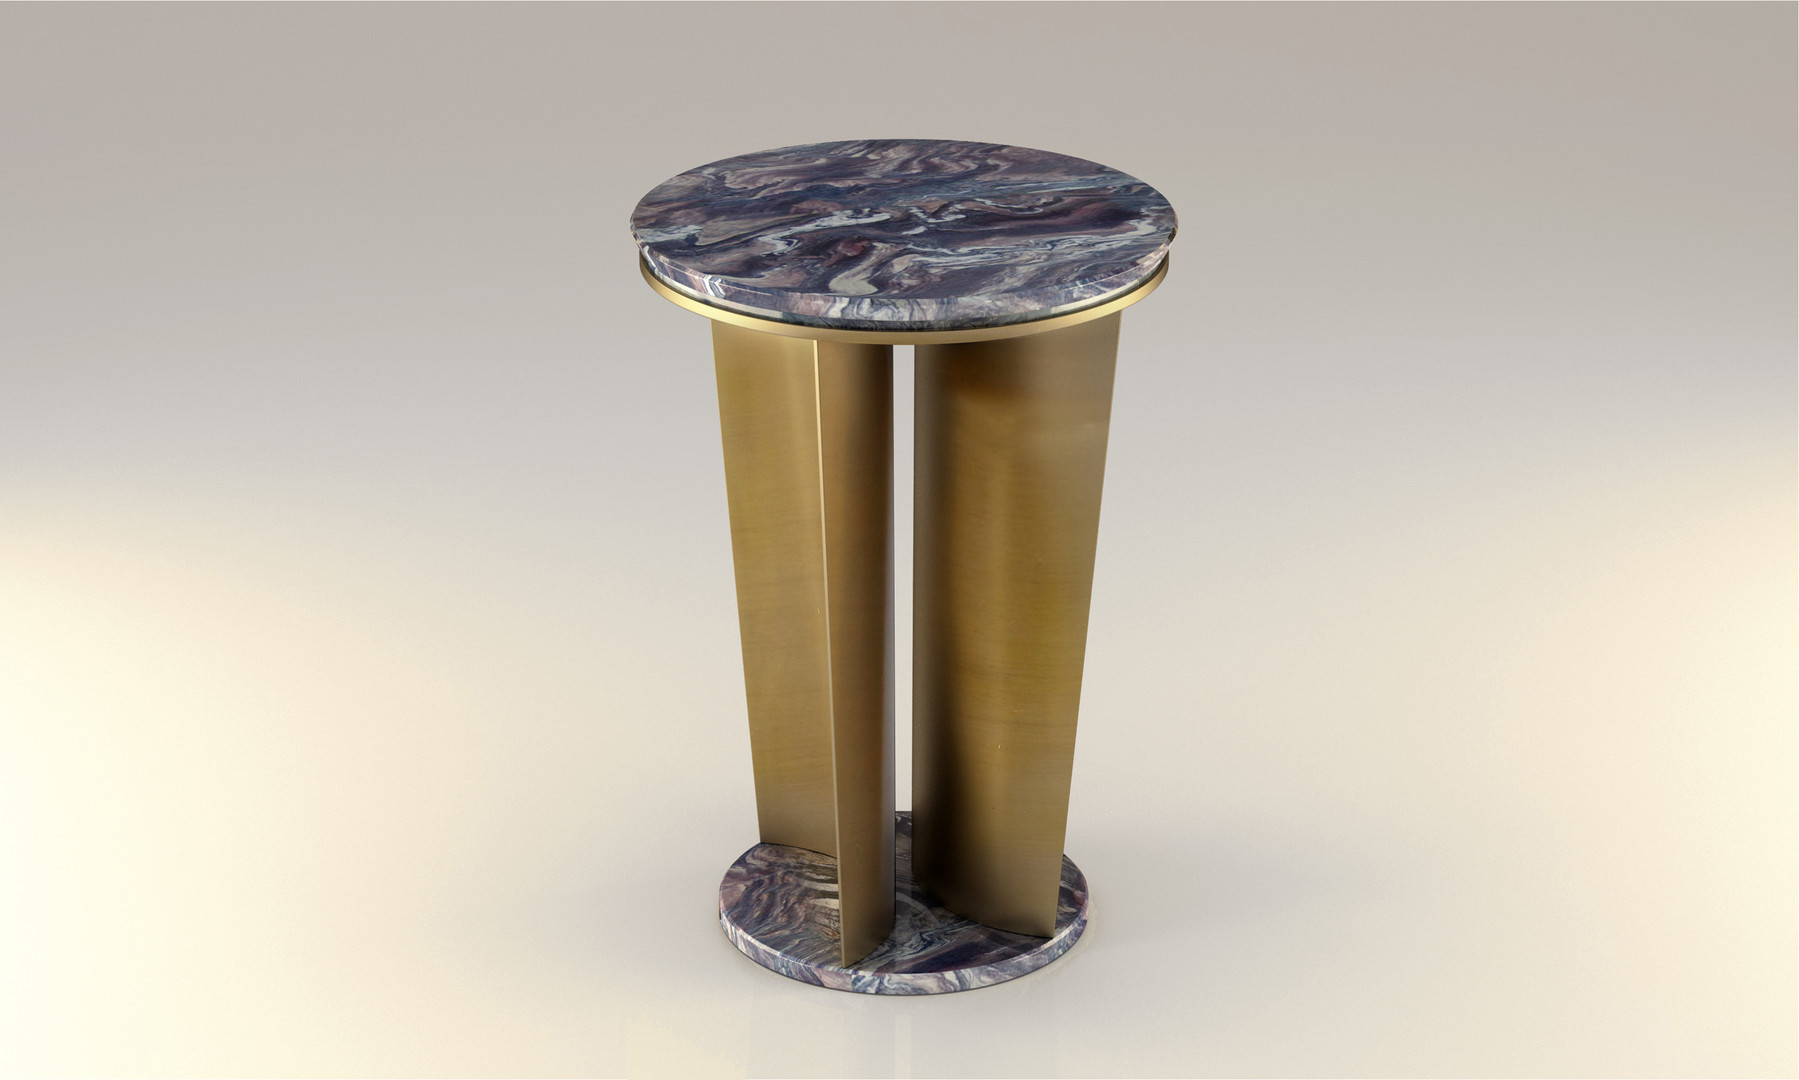 AUXILIARY TABLE